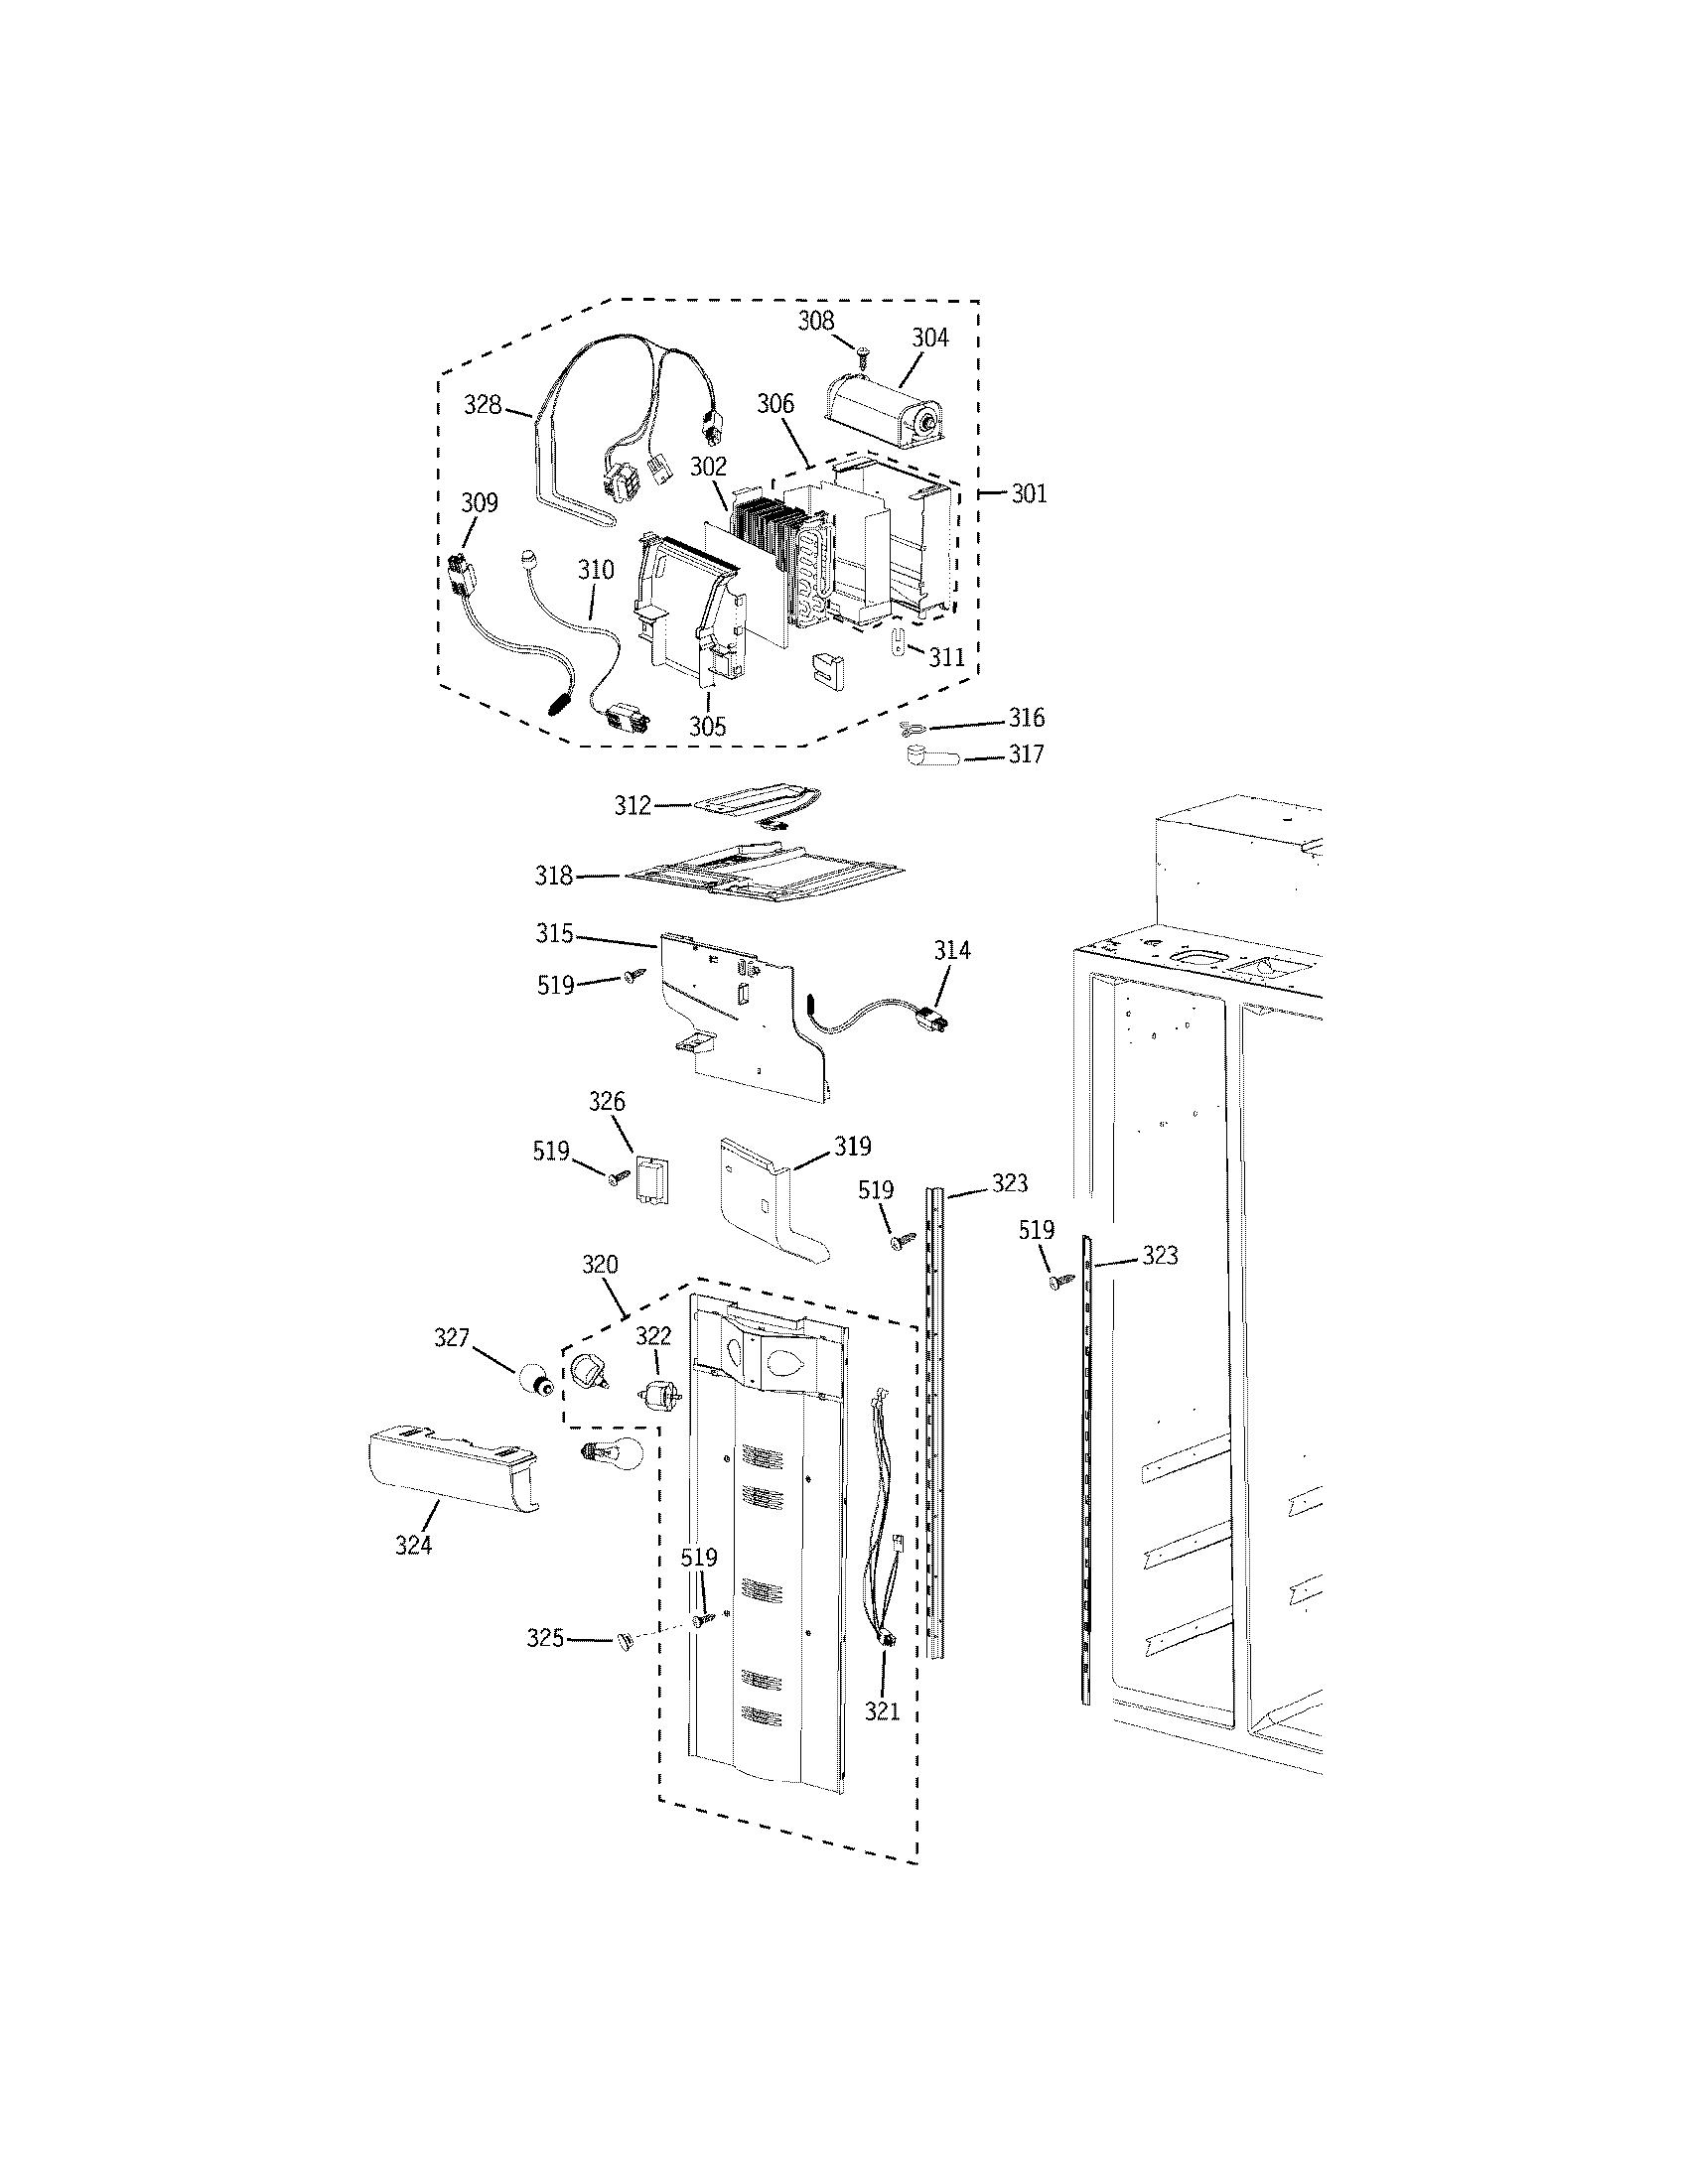 Electrolux model E42BS75EPS side-by-side refrigerator